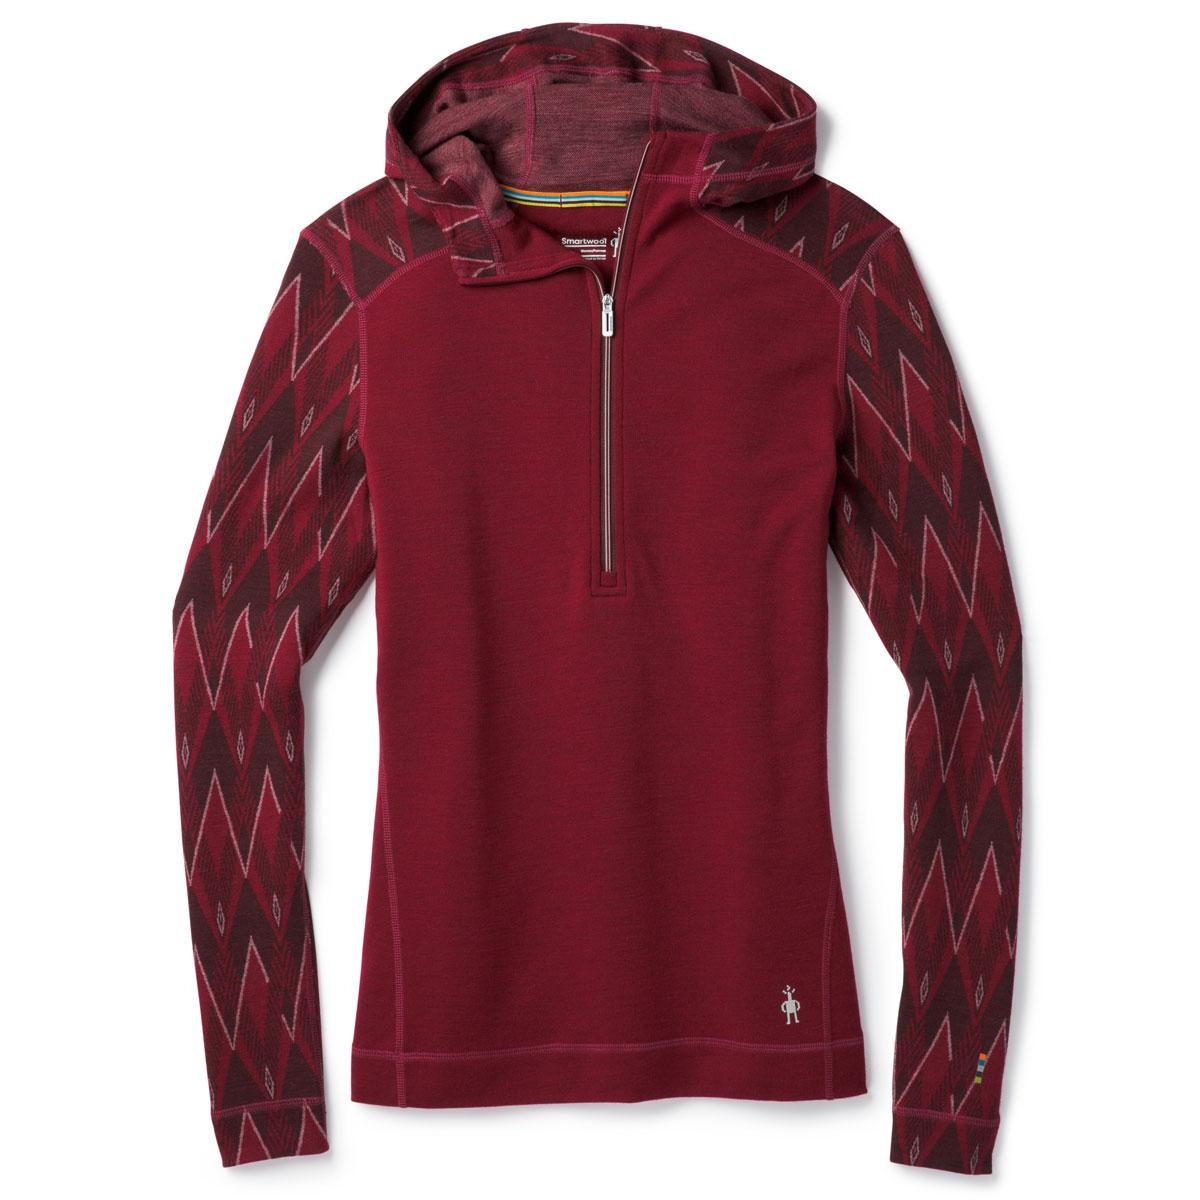 Smartwool Women's Merino 250 Half Zip Hoodie Base Layer - Red, XL